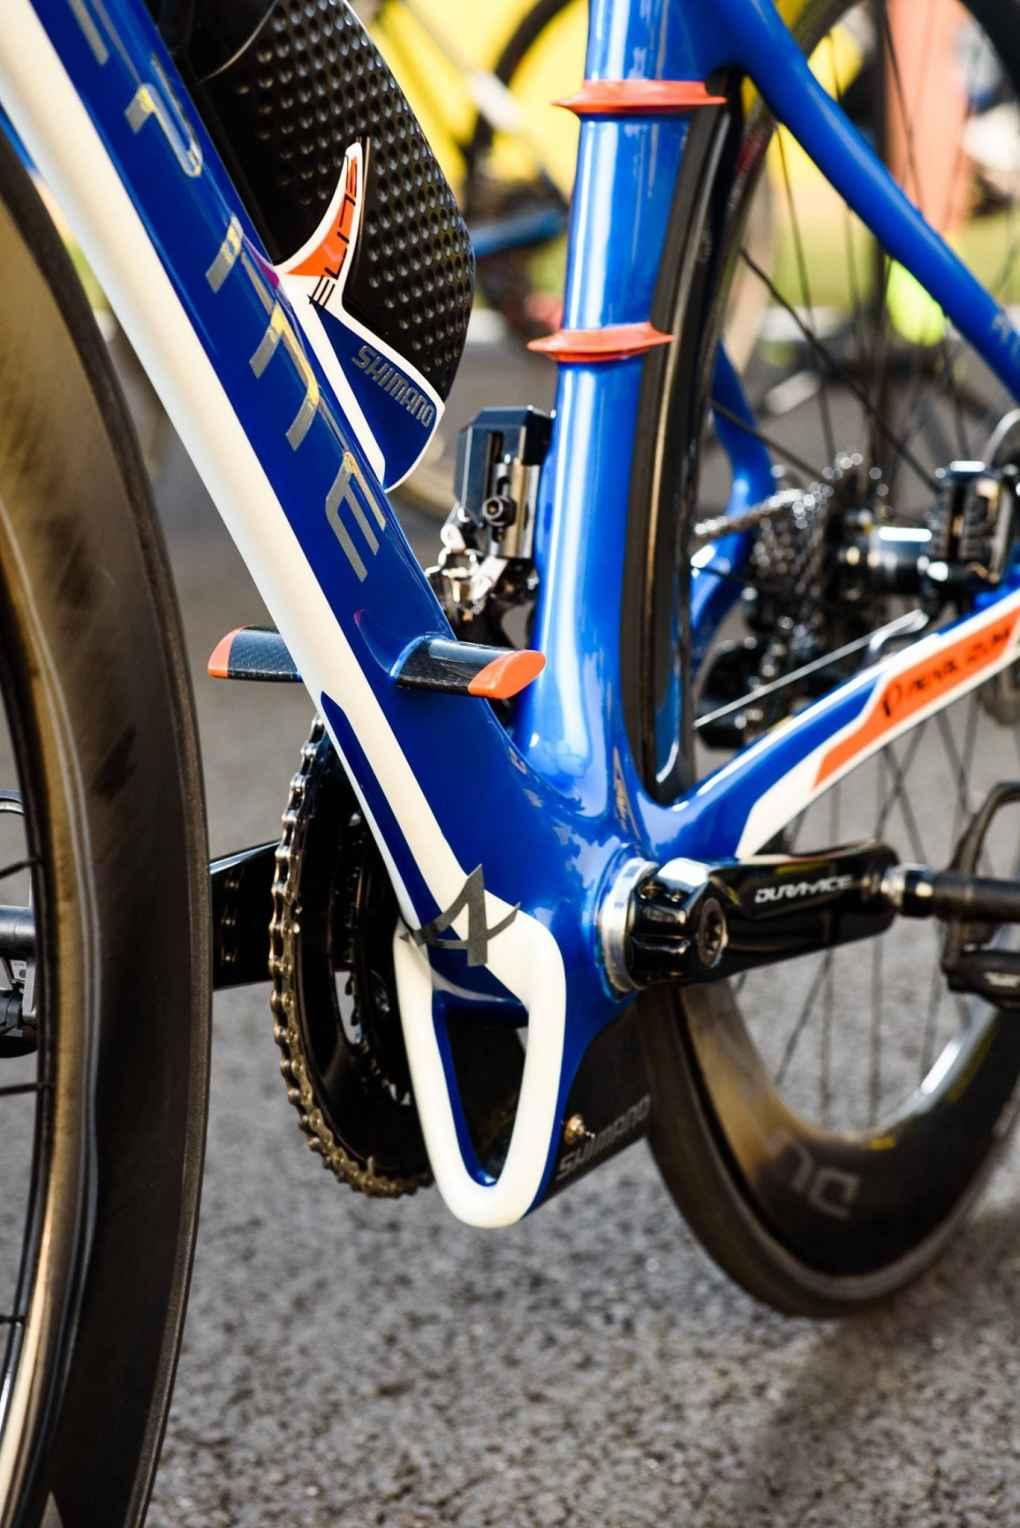 Velo Course Alpine 36 24 Heures Mans Deco Bike - 12